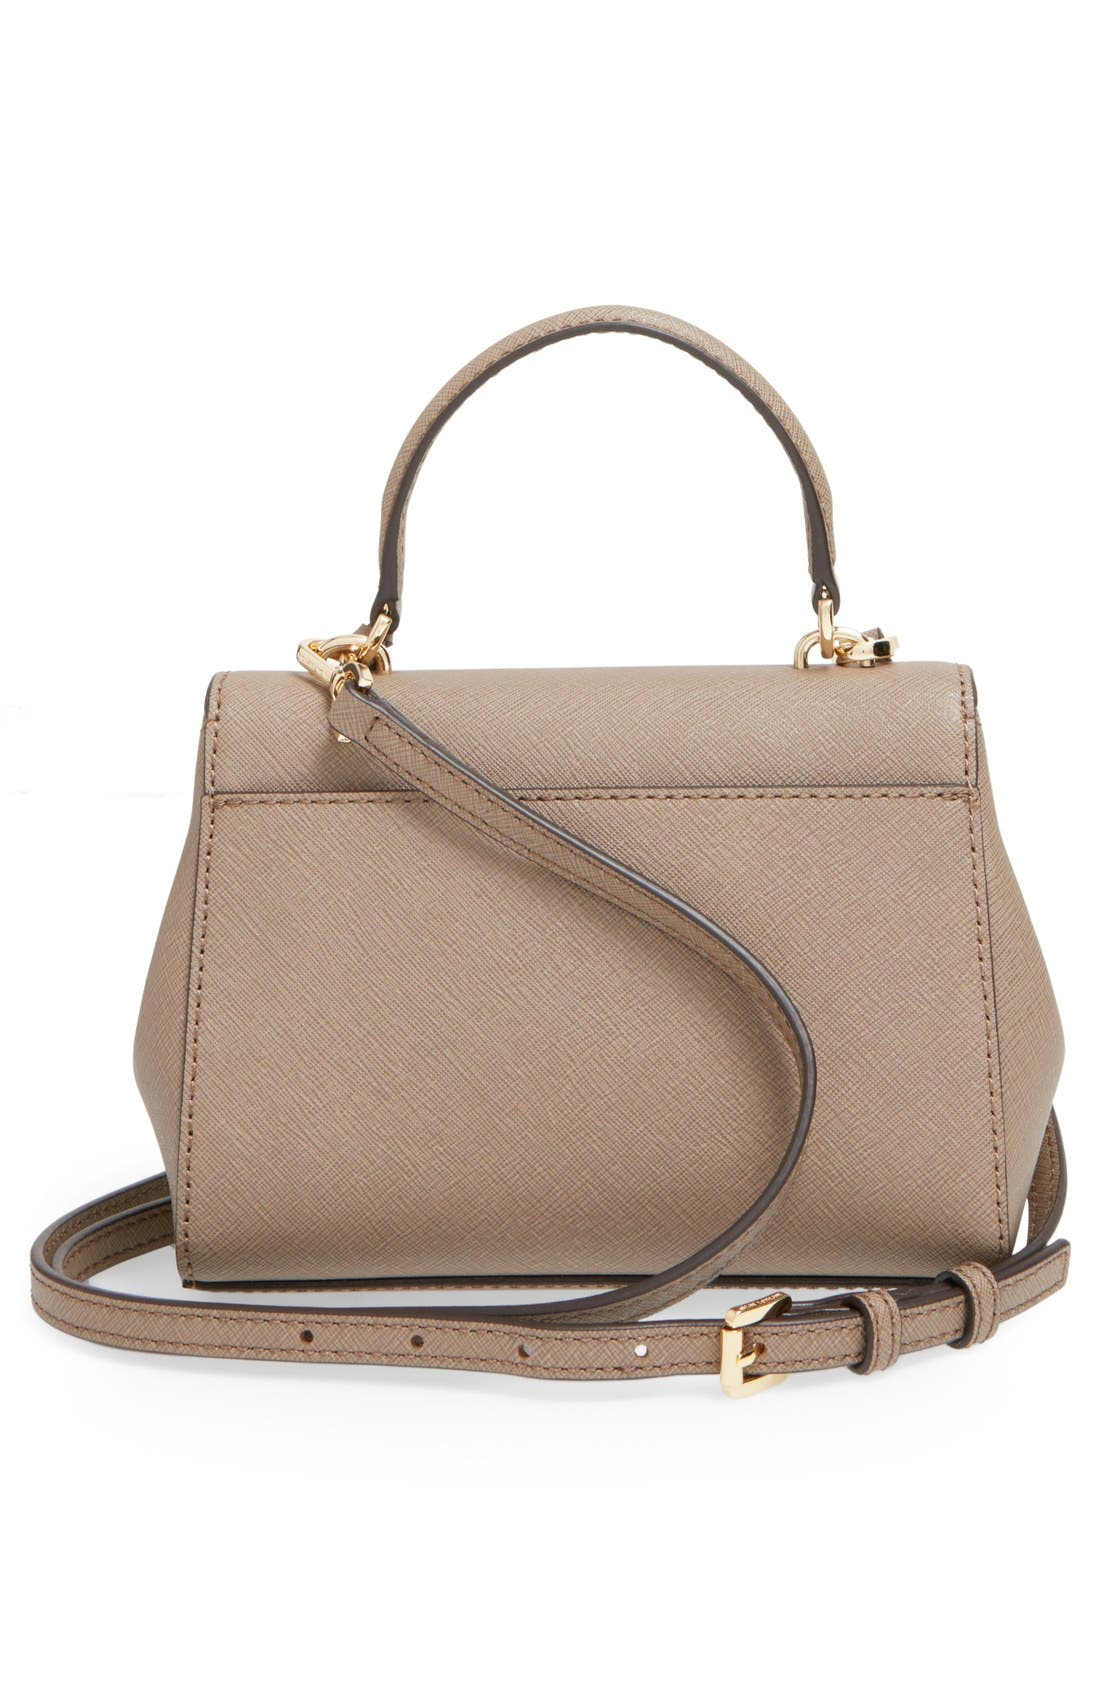 Alternate Image 3  - MICHAEL Michael Kors 'Extra Small Ava' Leather Crossbody Bag